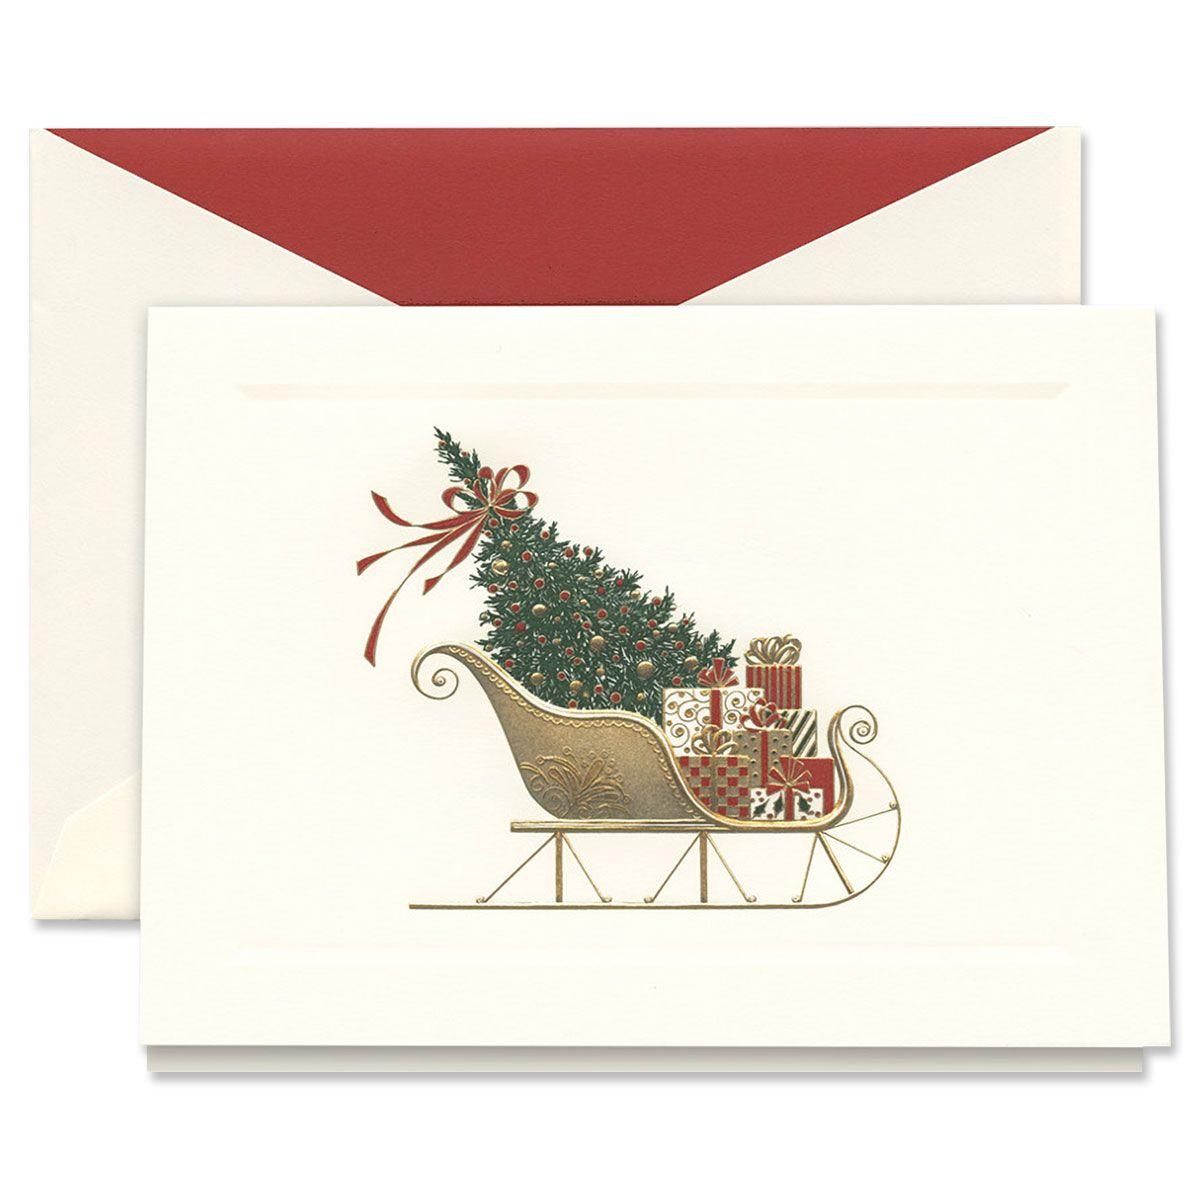 Engraved Santa's Sleigh Holiday Greeting Cards Boxed Set